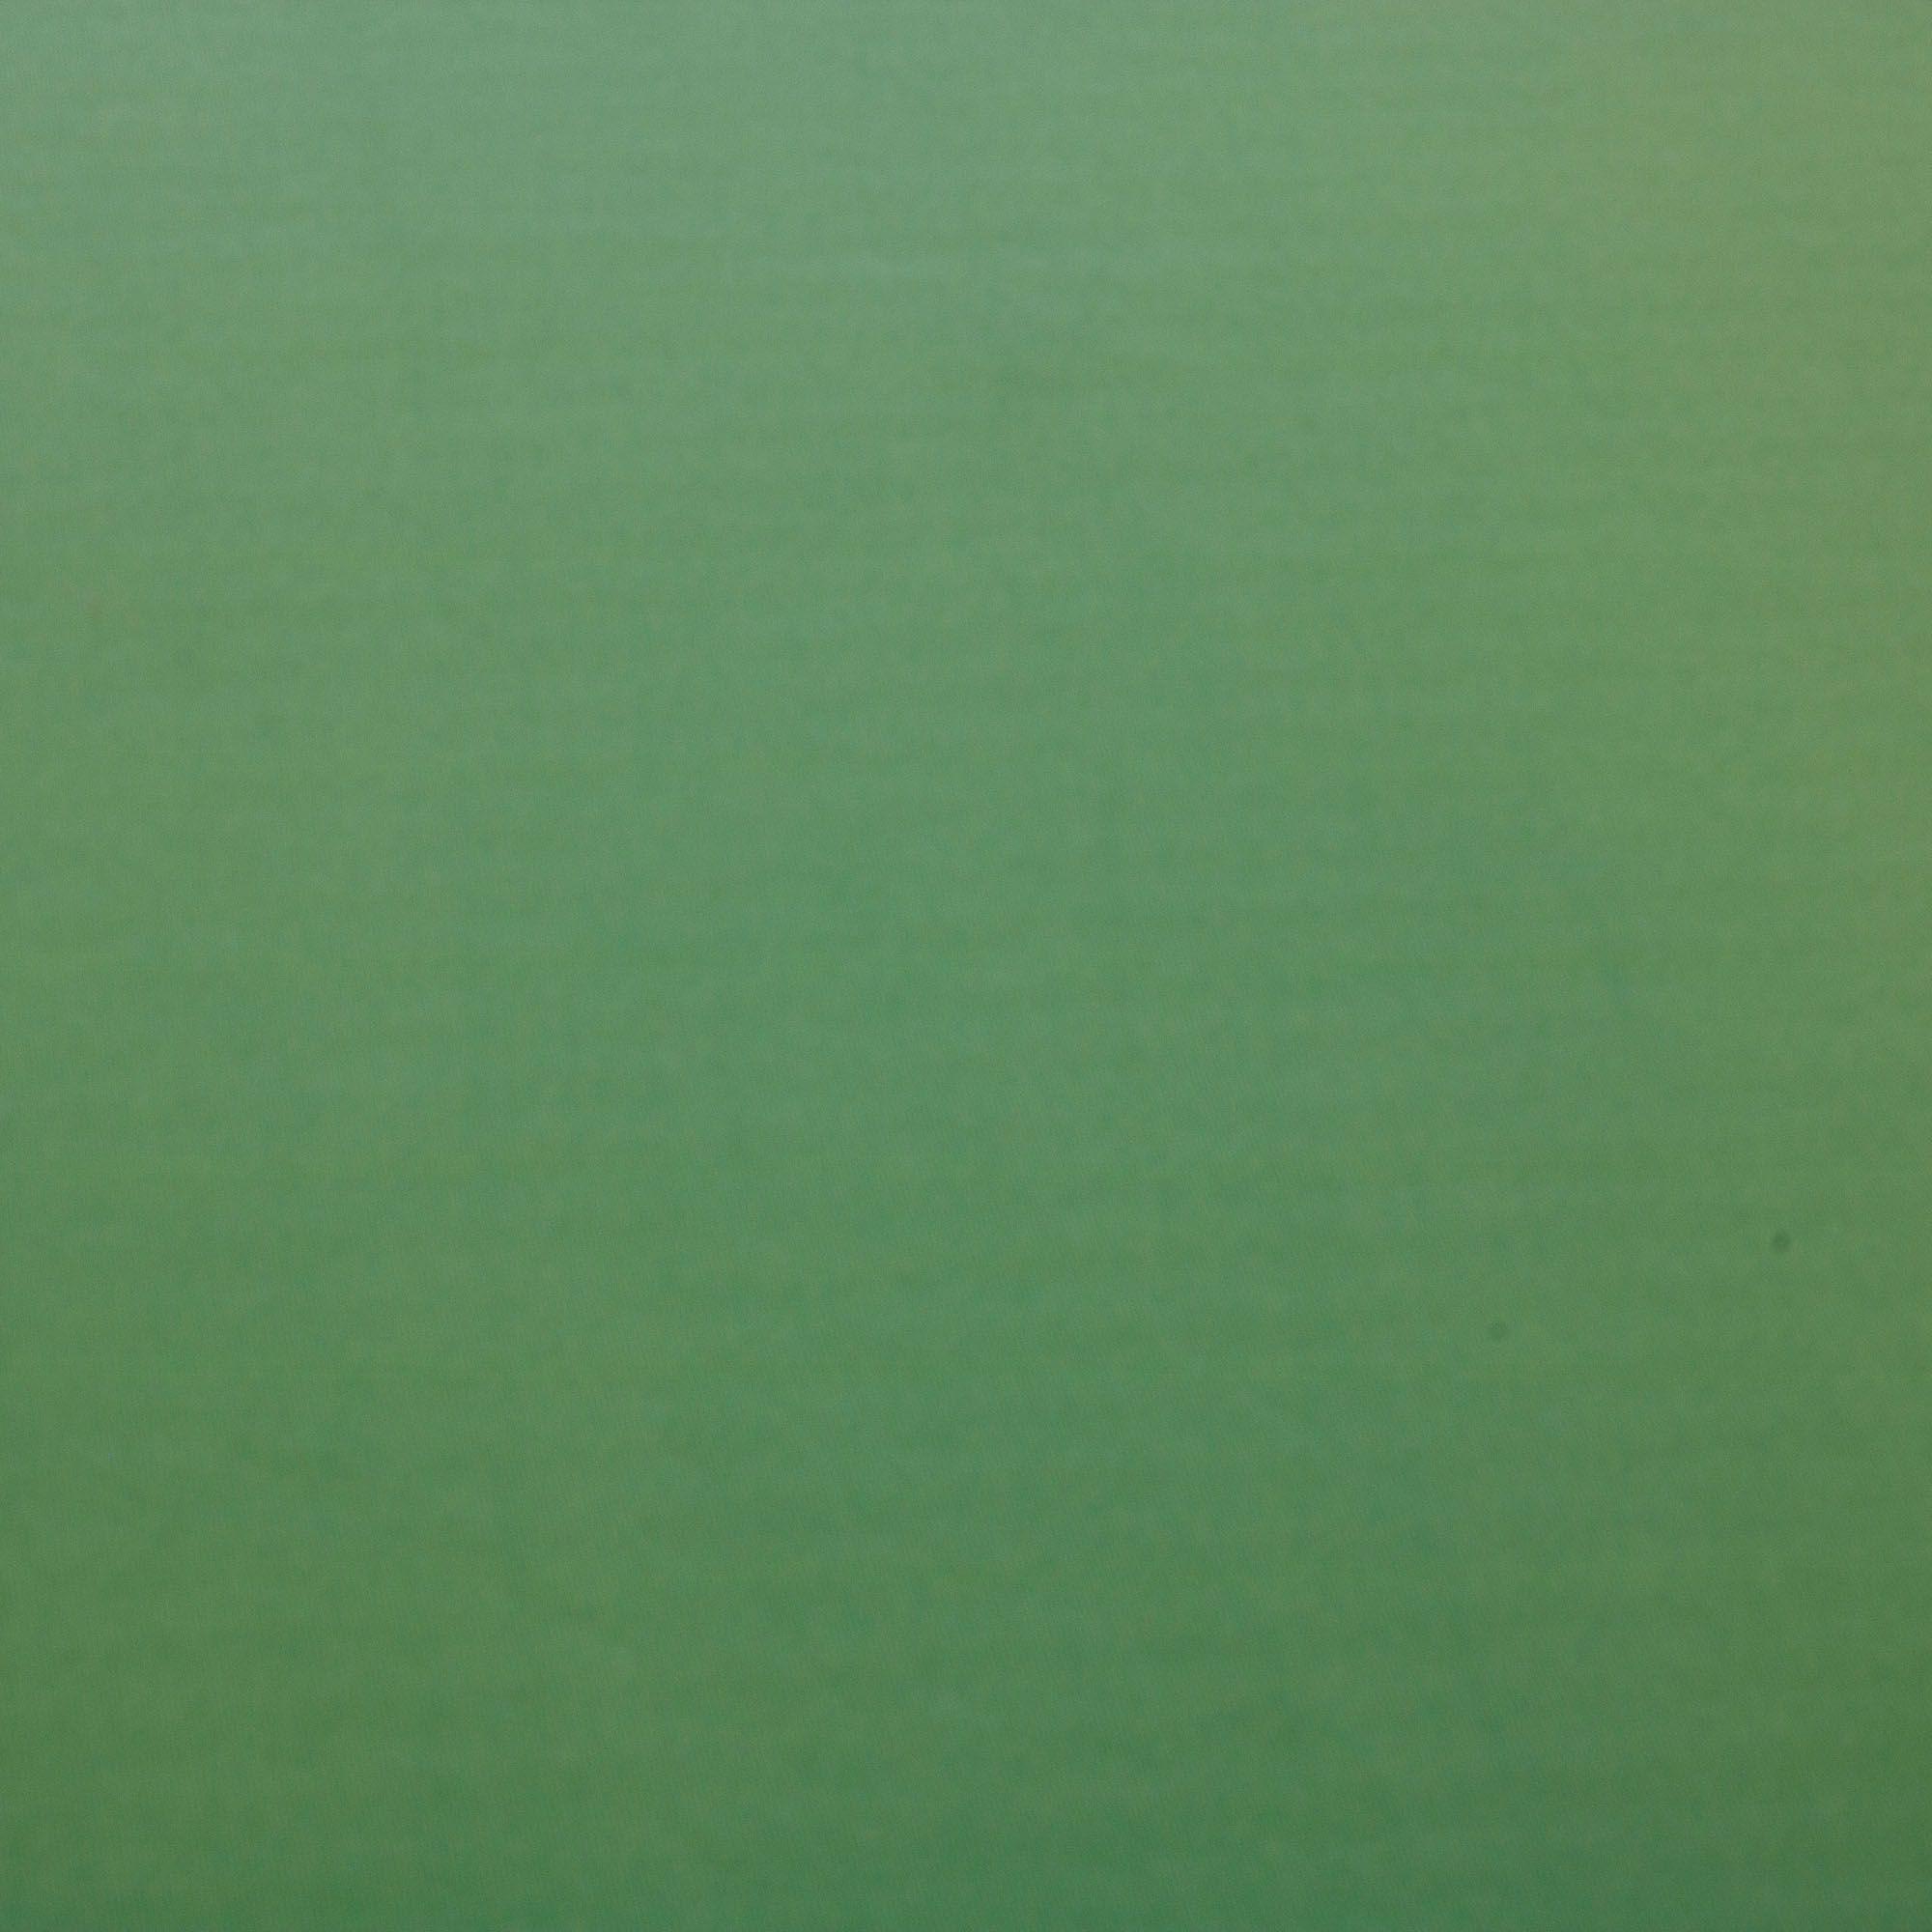 Tecido Malha Neoprene 95% Poliester 5% Elastano Verde